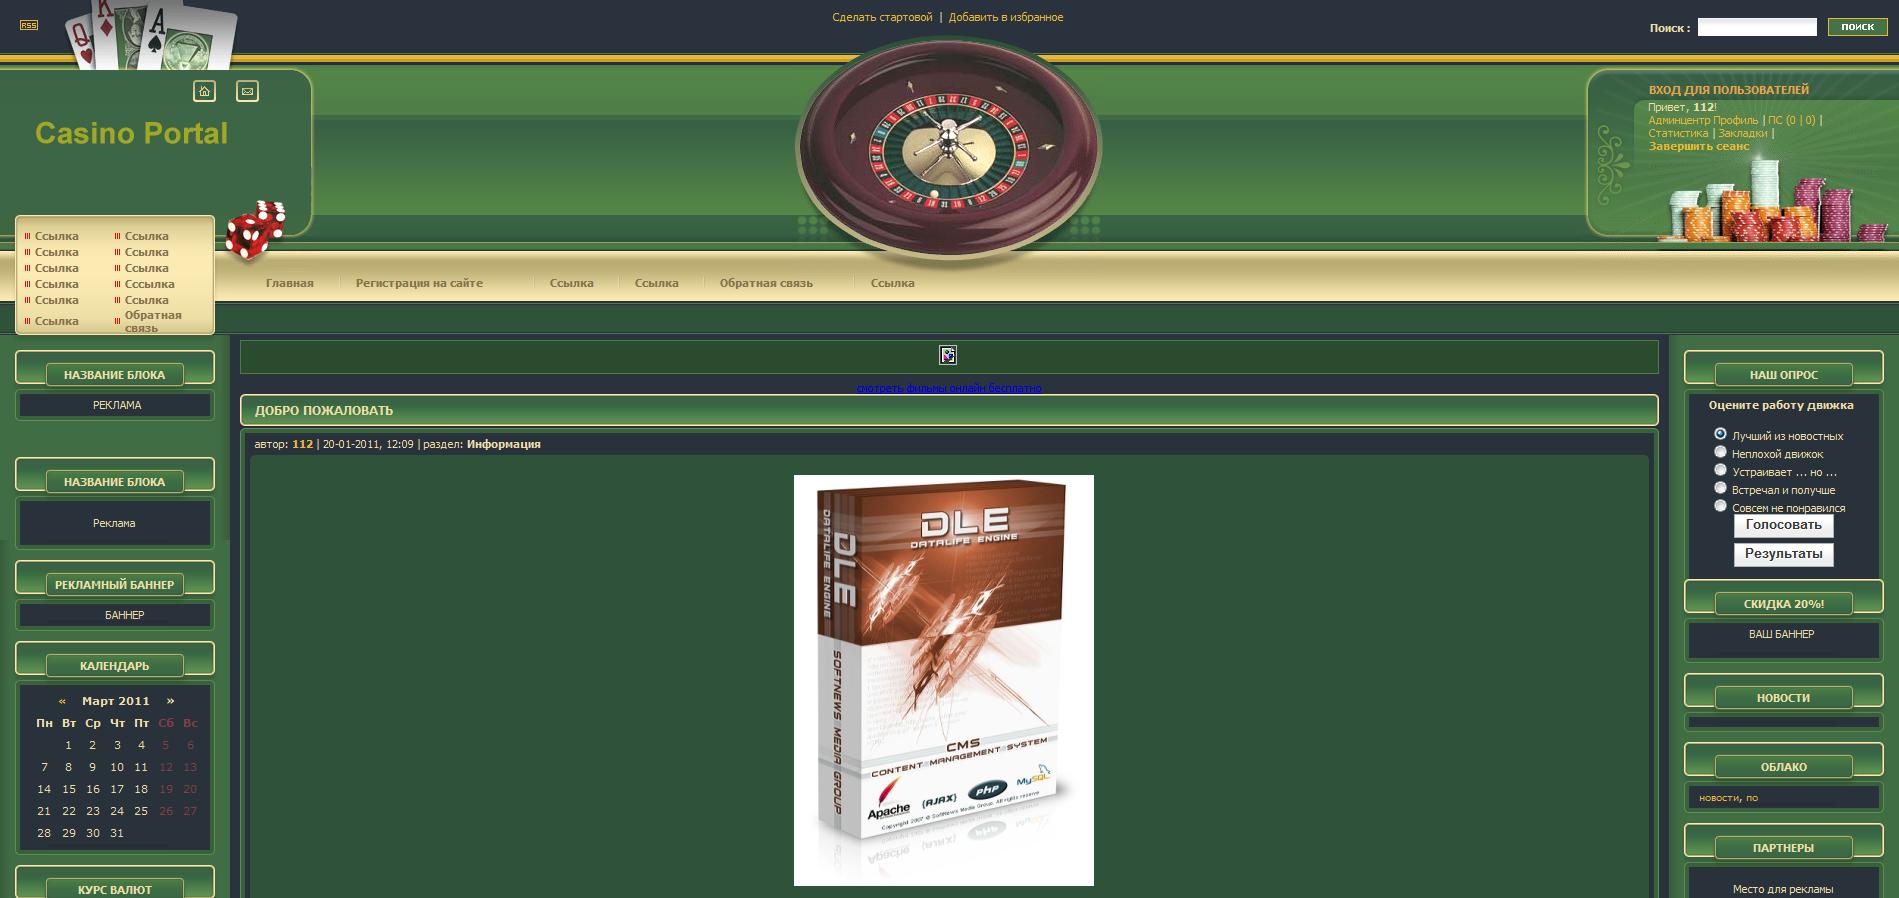 Шаблоны для dle азартные игры азартные игровые слот аппараты бесплатно